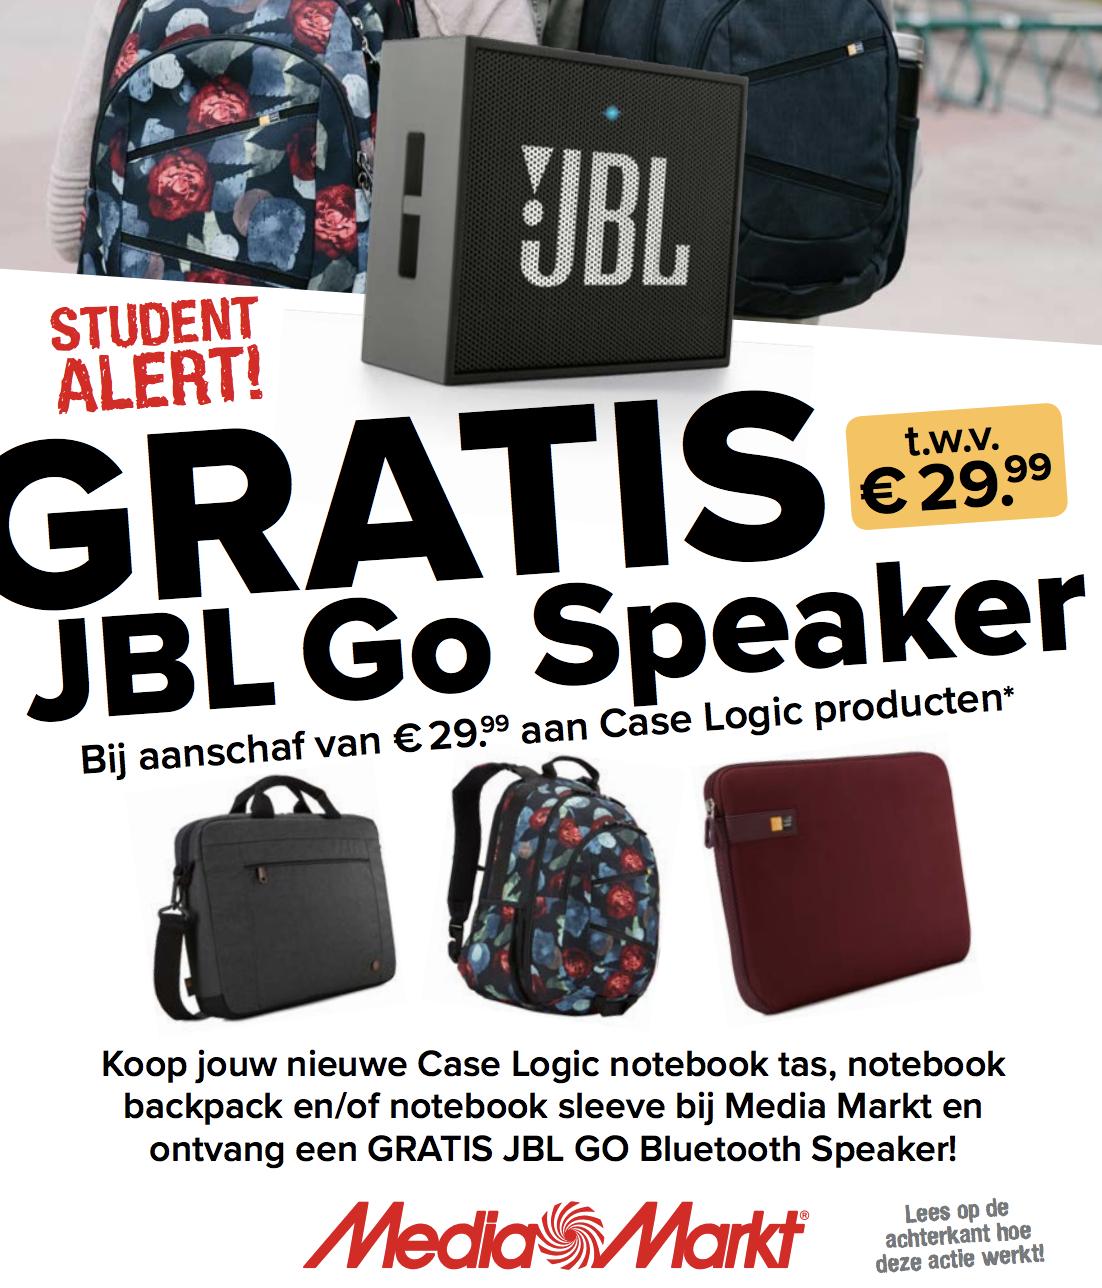 Gratis JBL Go Speaker bij Case Logic product via Media Markt!